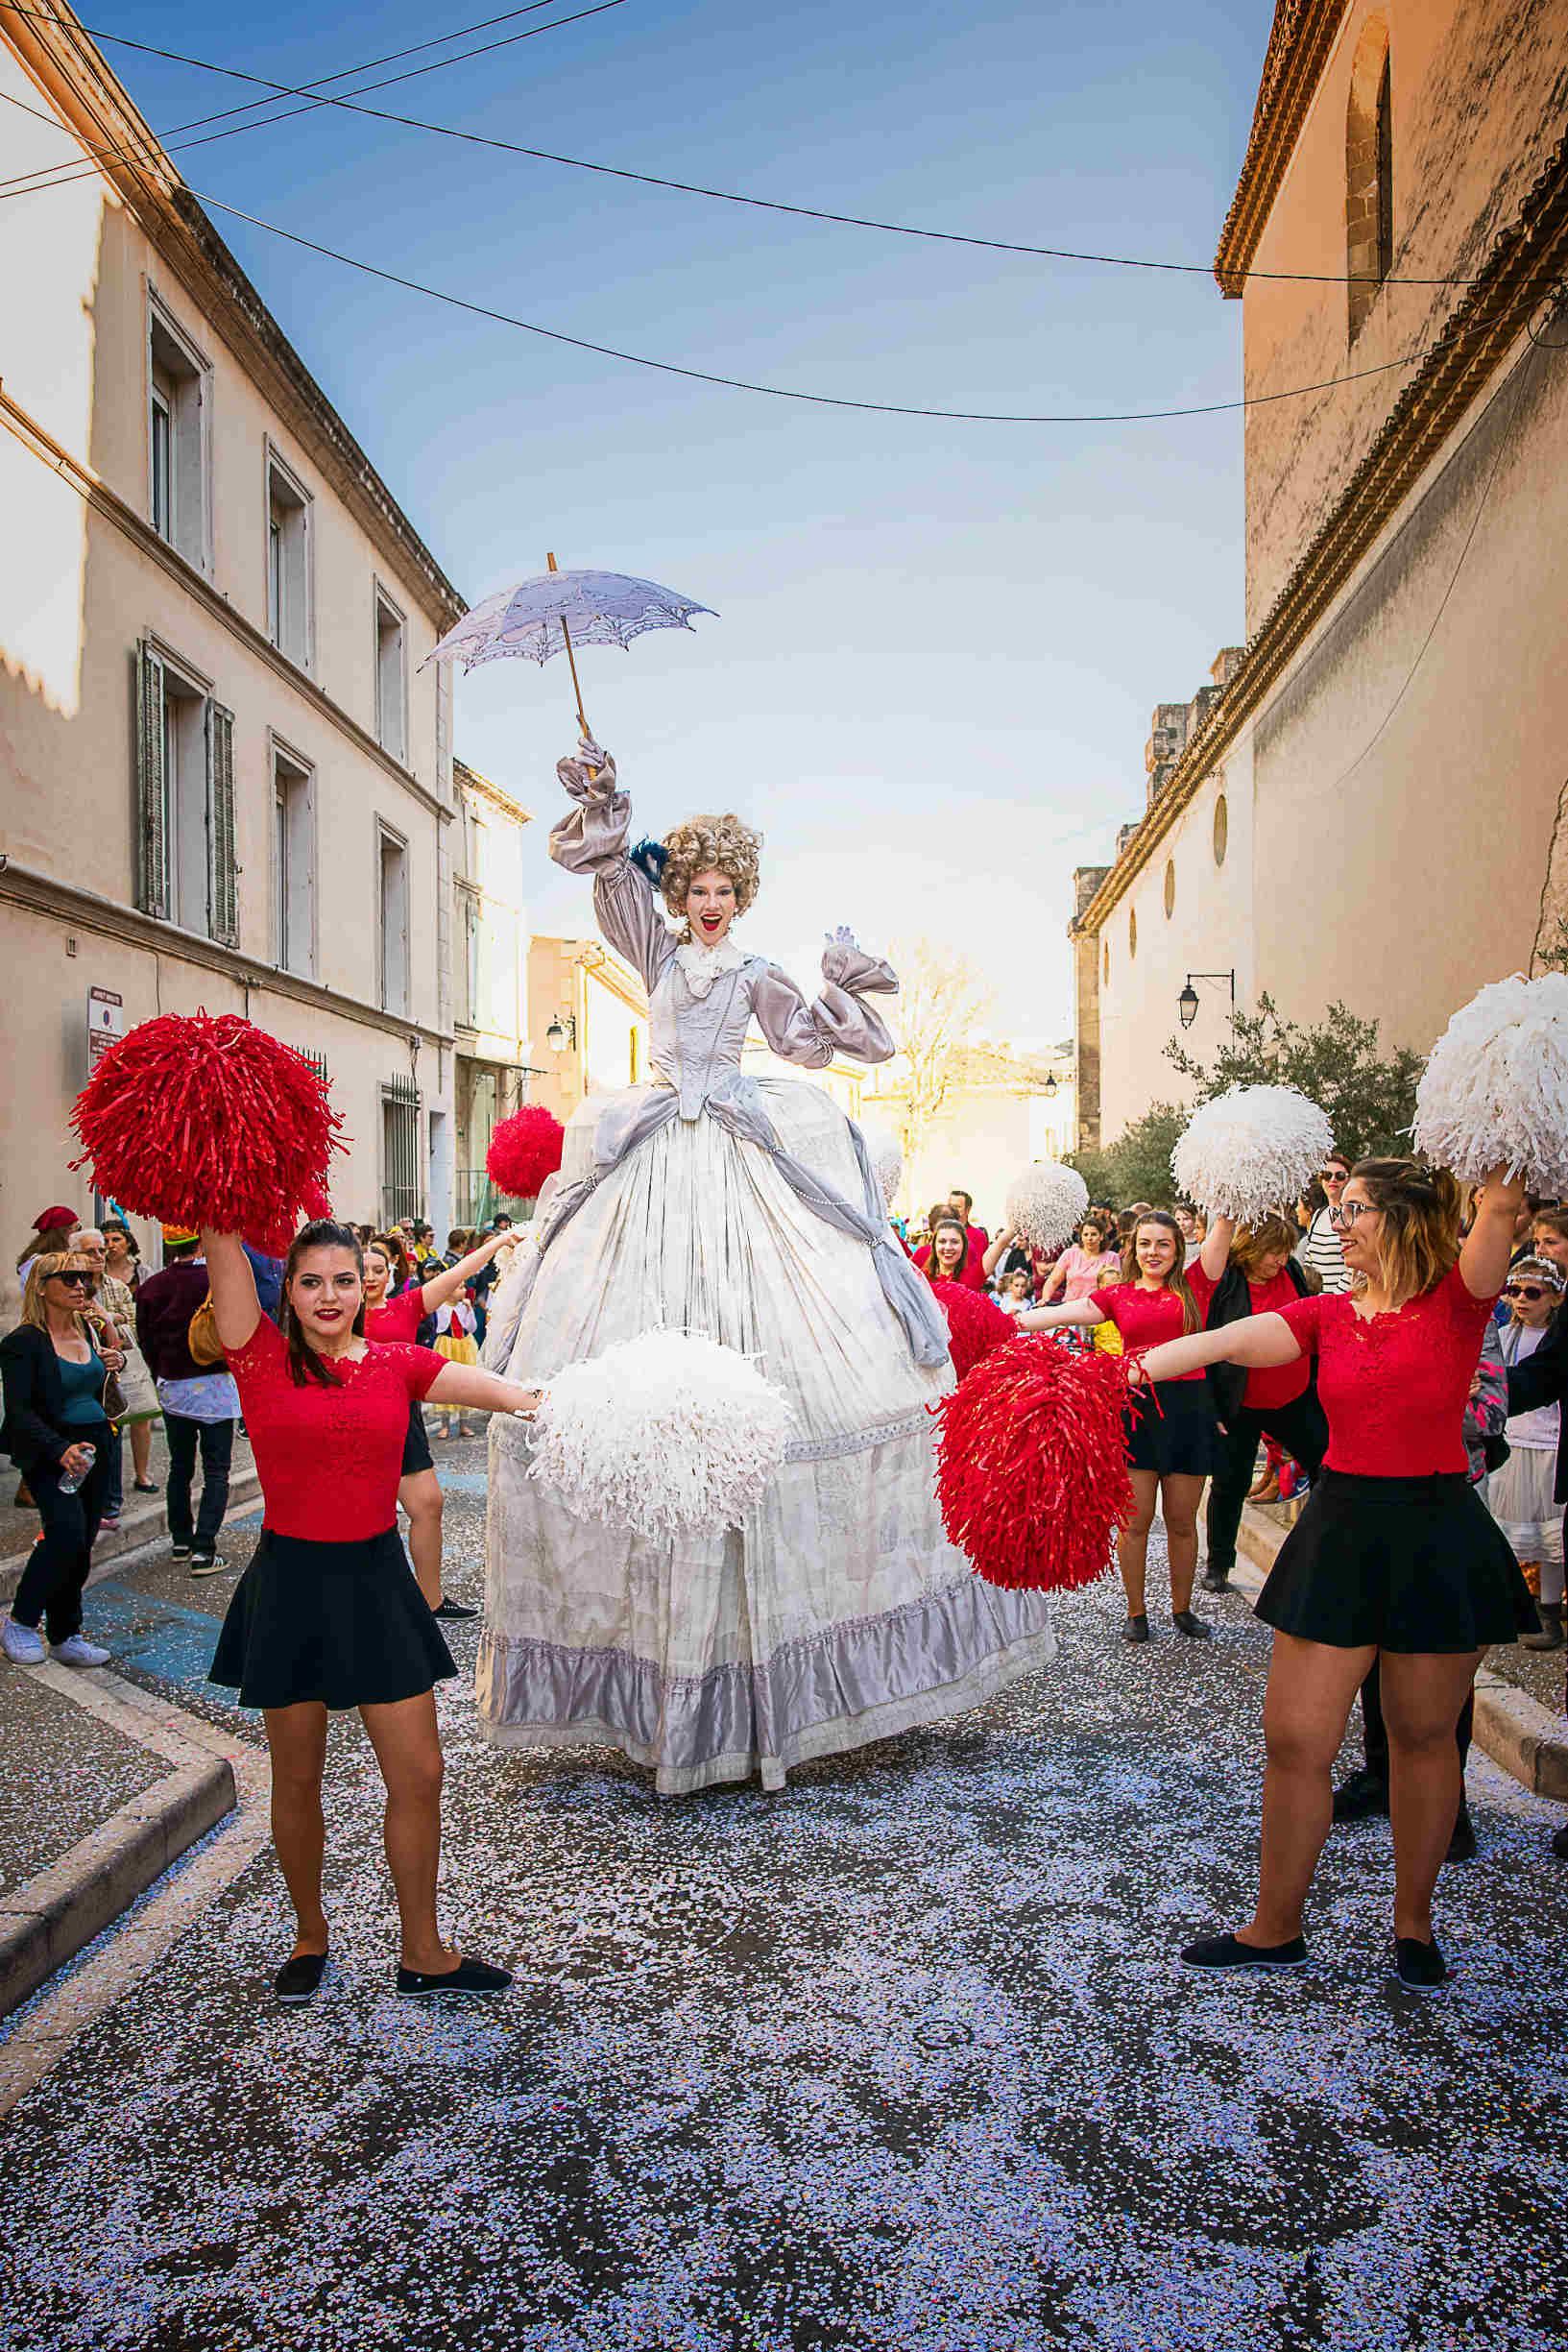 echassier-baroque-carnaval-cirque-indigo